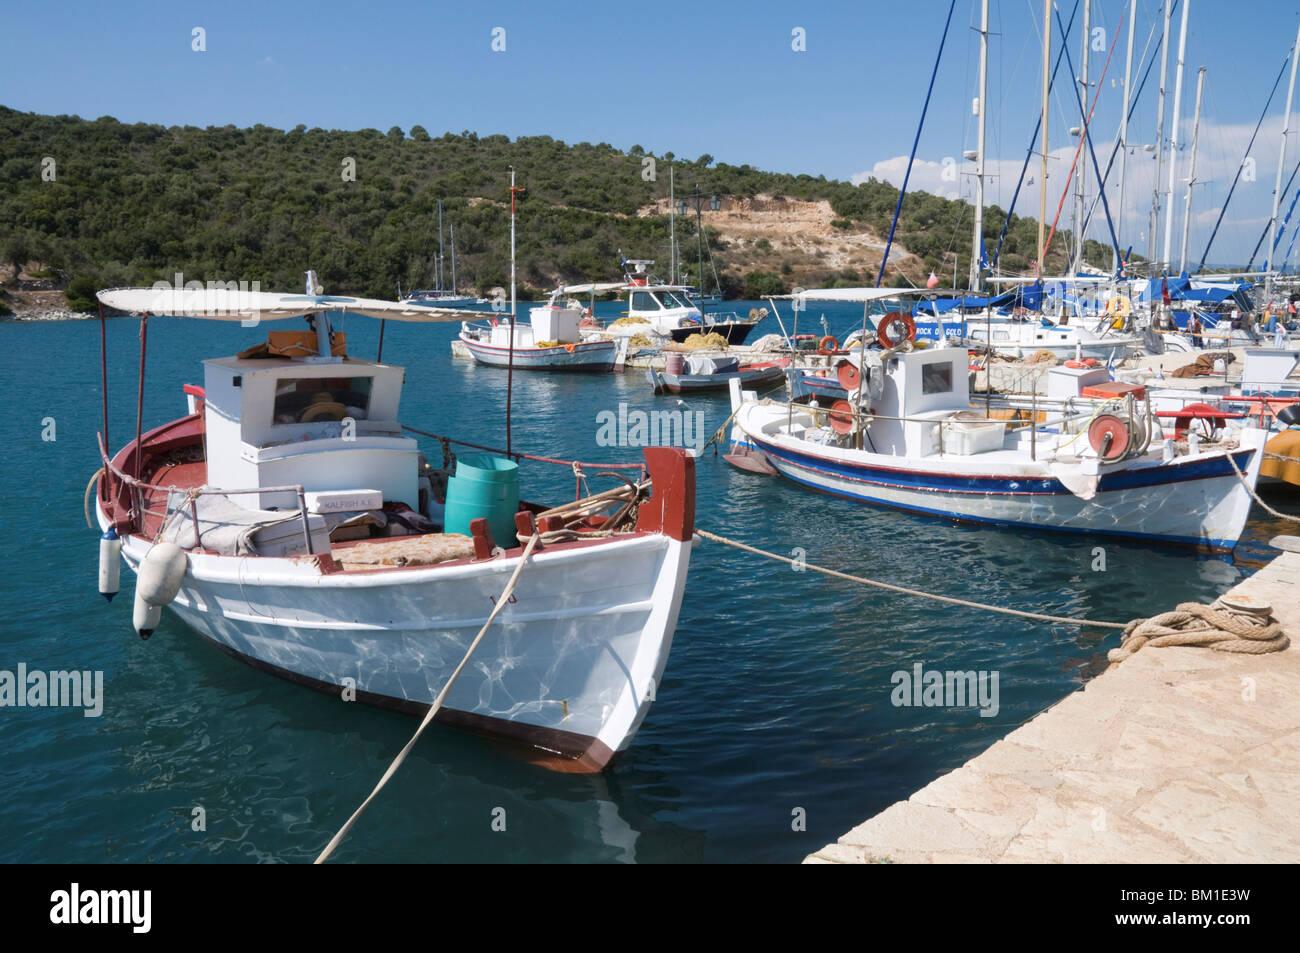 Fishing boats, Meganisi, Ionian Islands, Greek Islands, Greece, Europe - Stock Image